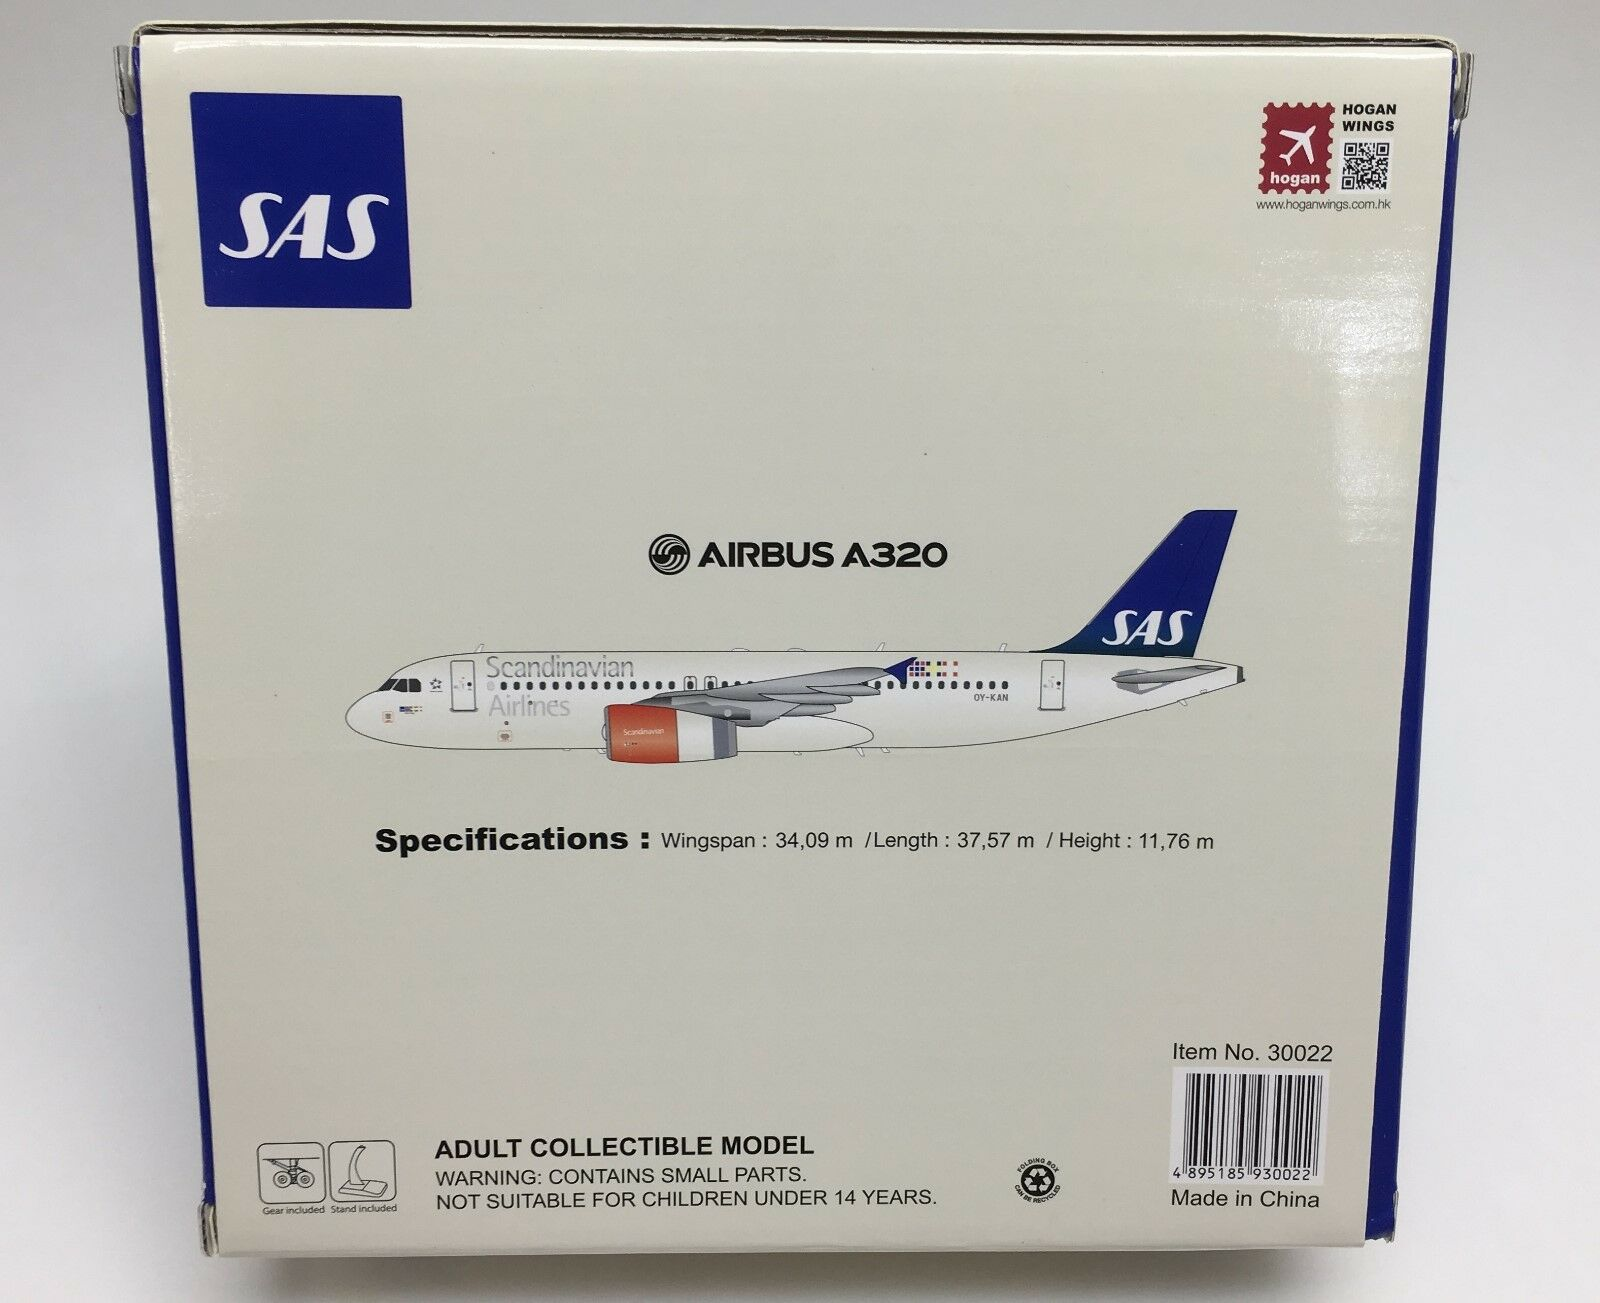 Hogan Wings 30022, 30022, 30022, Airbus A320, SAS, Scandinavian, 1 200 307579